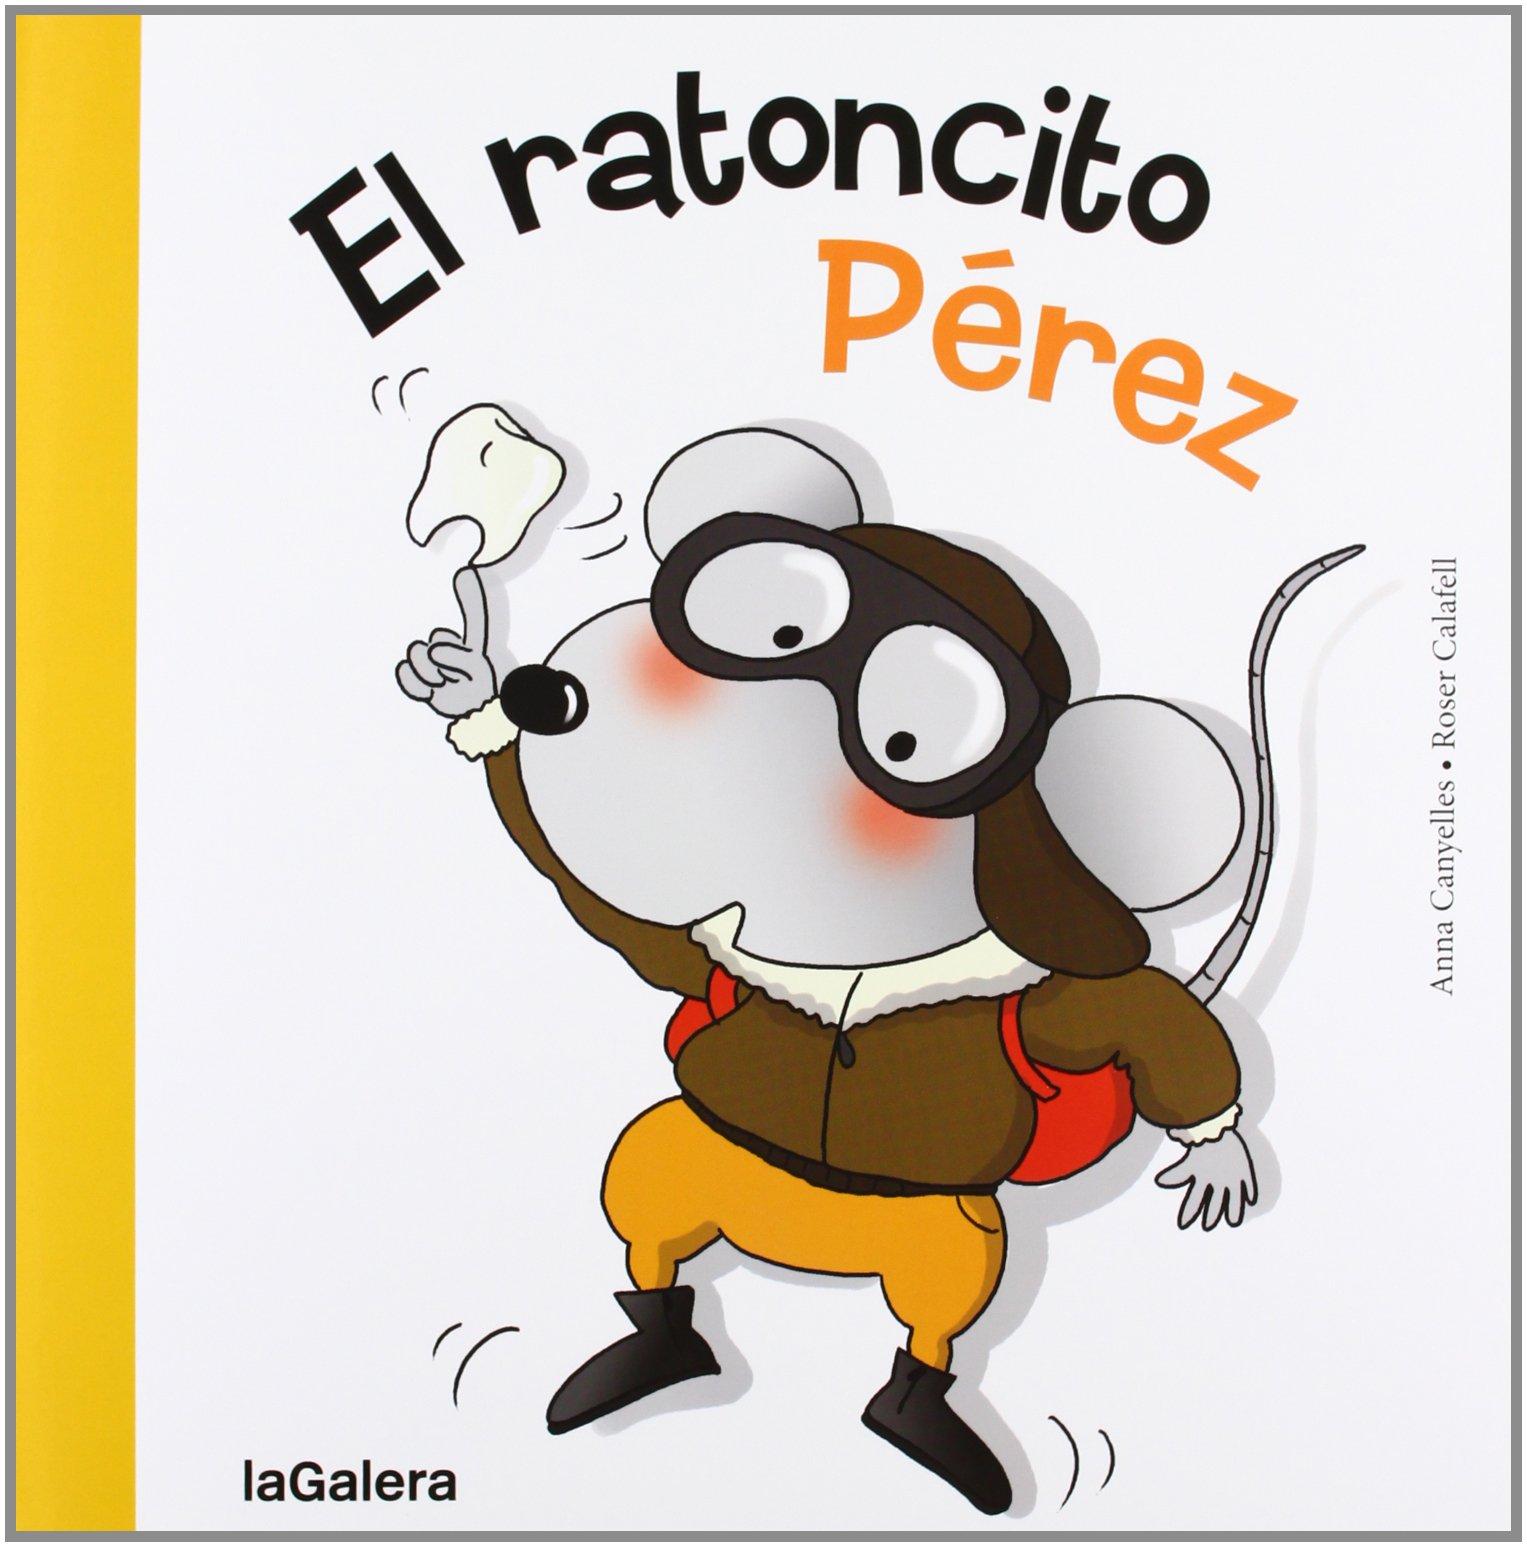 El Ratoncito Pérez 67 Tradiciones Amazon Es Canyelles Anna Calafell Roser Libros